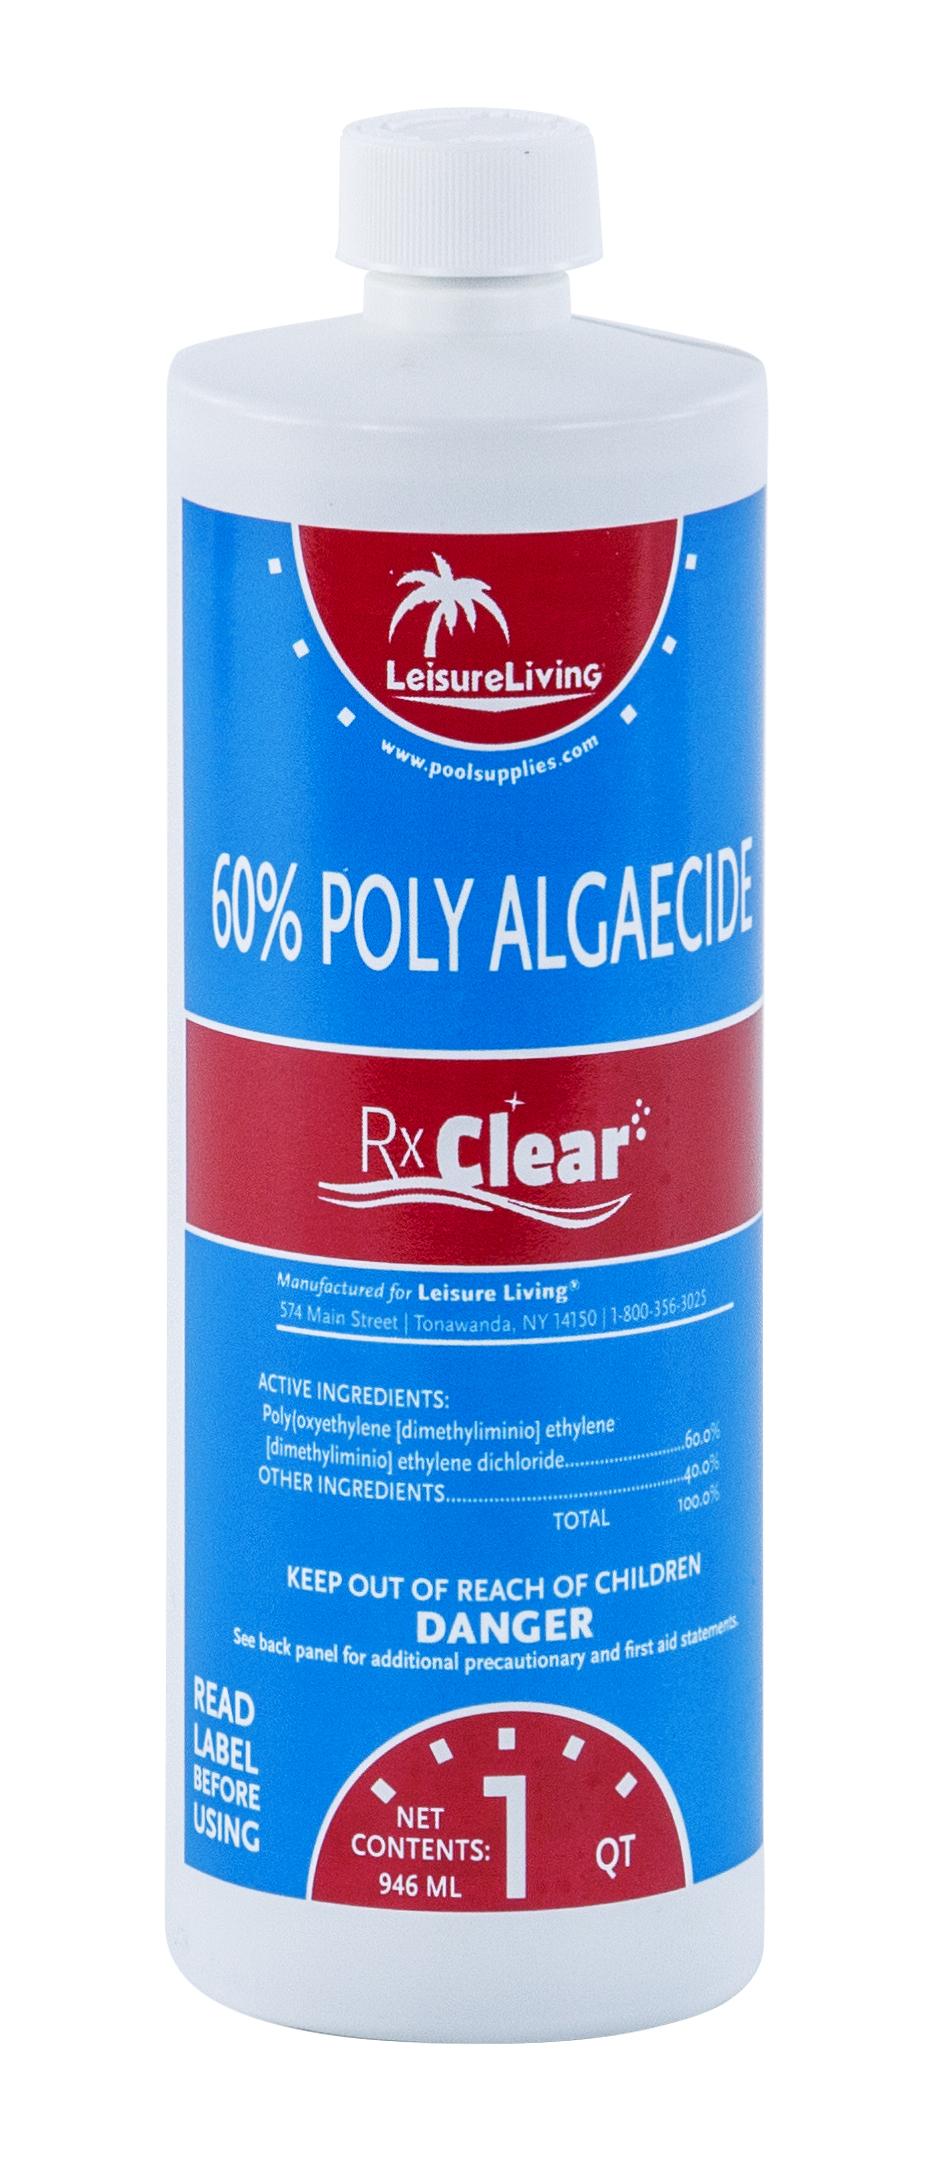 Rx Clear Swimming Pool Algaecide 60 Plus 1 Qt